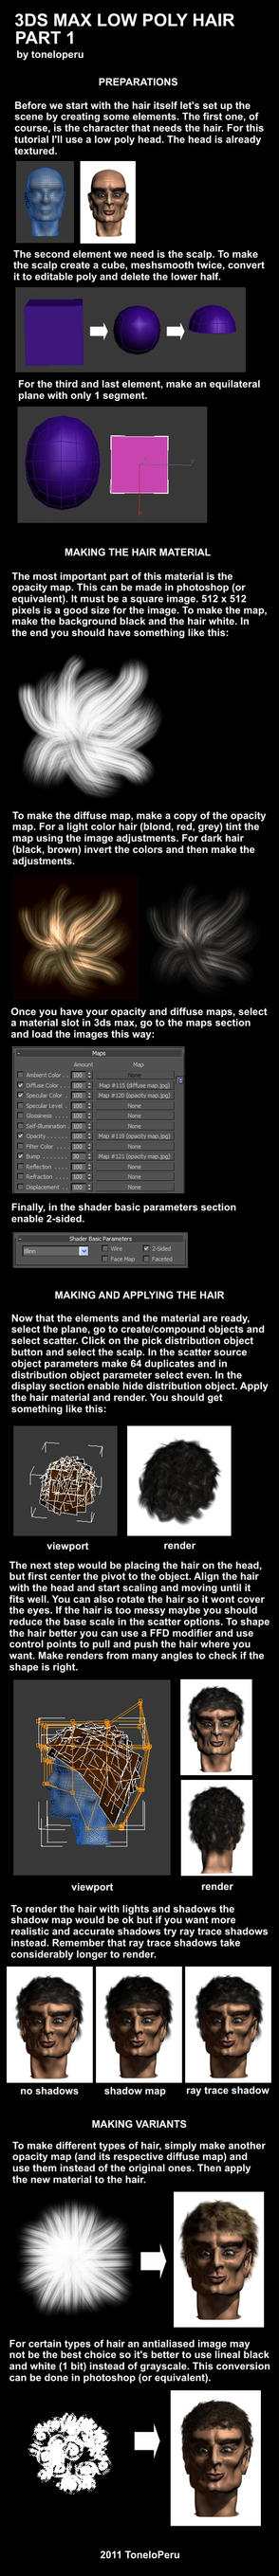 Low poly hair tutorial pt 1 by toneloperu